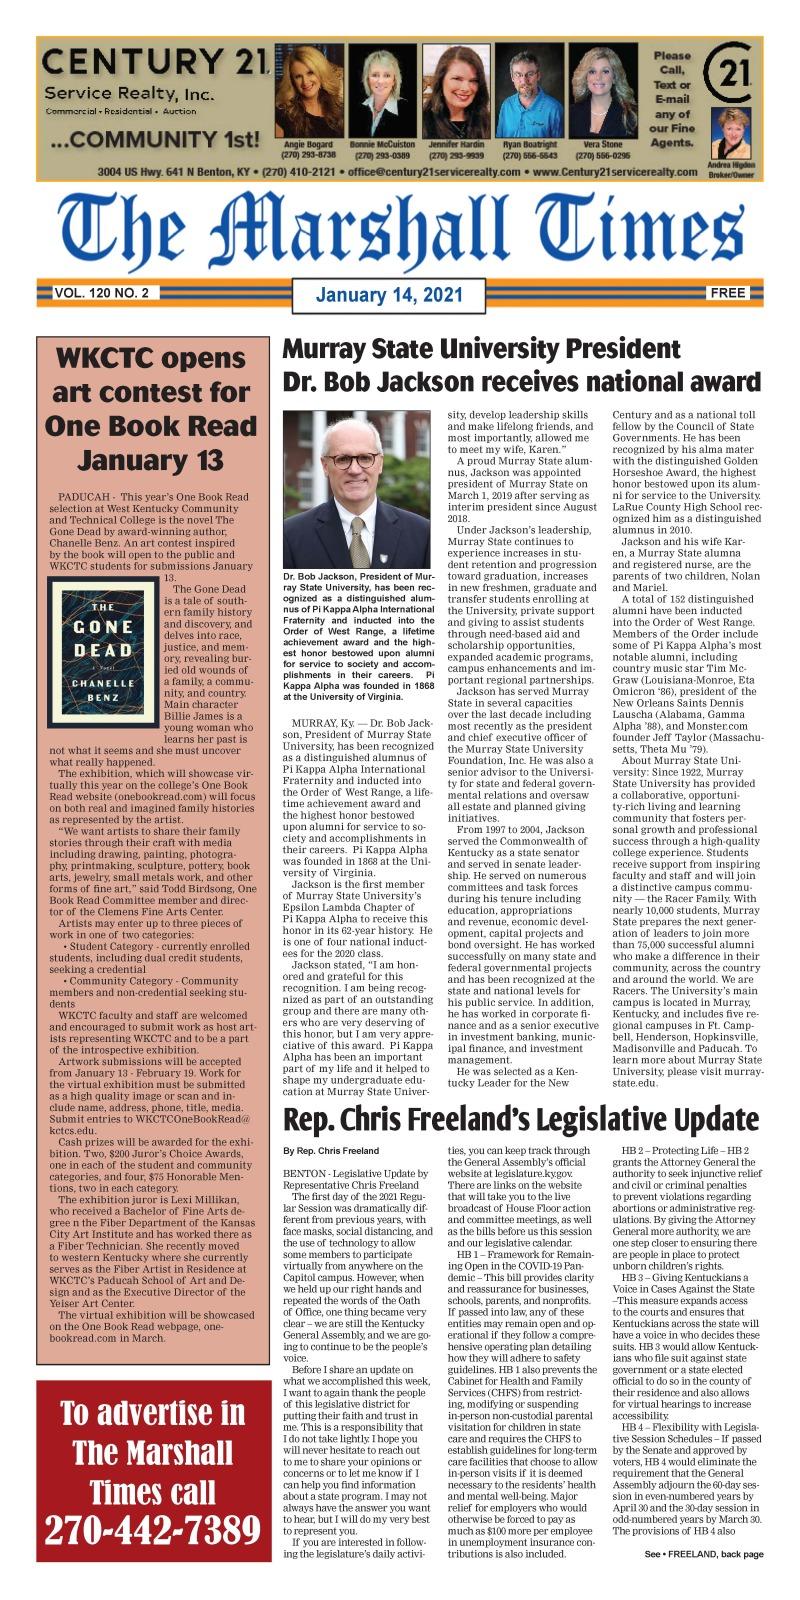 The Marshall Times 1-14-21